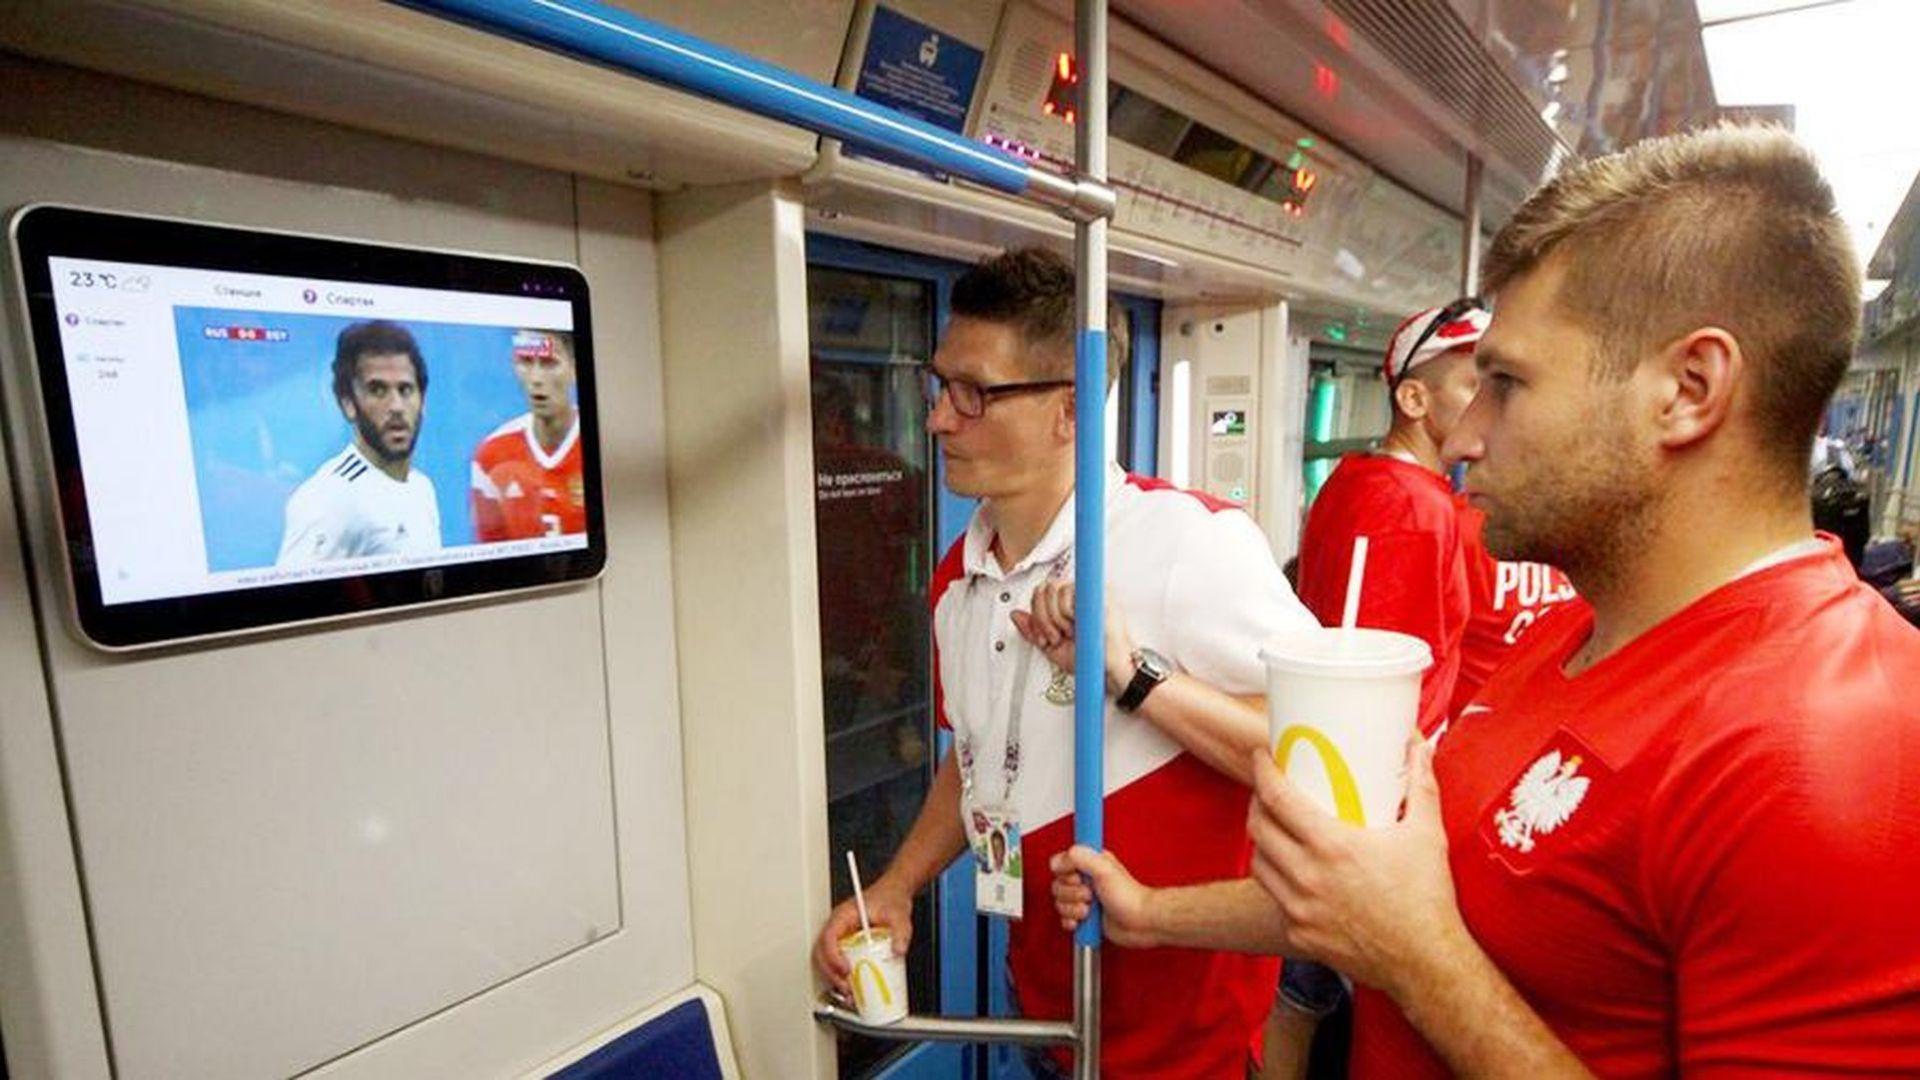 Над 14 милиона души гледали Мондиала в Московското метро